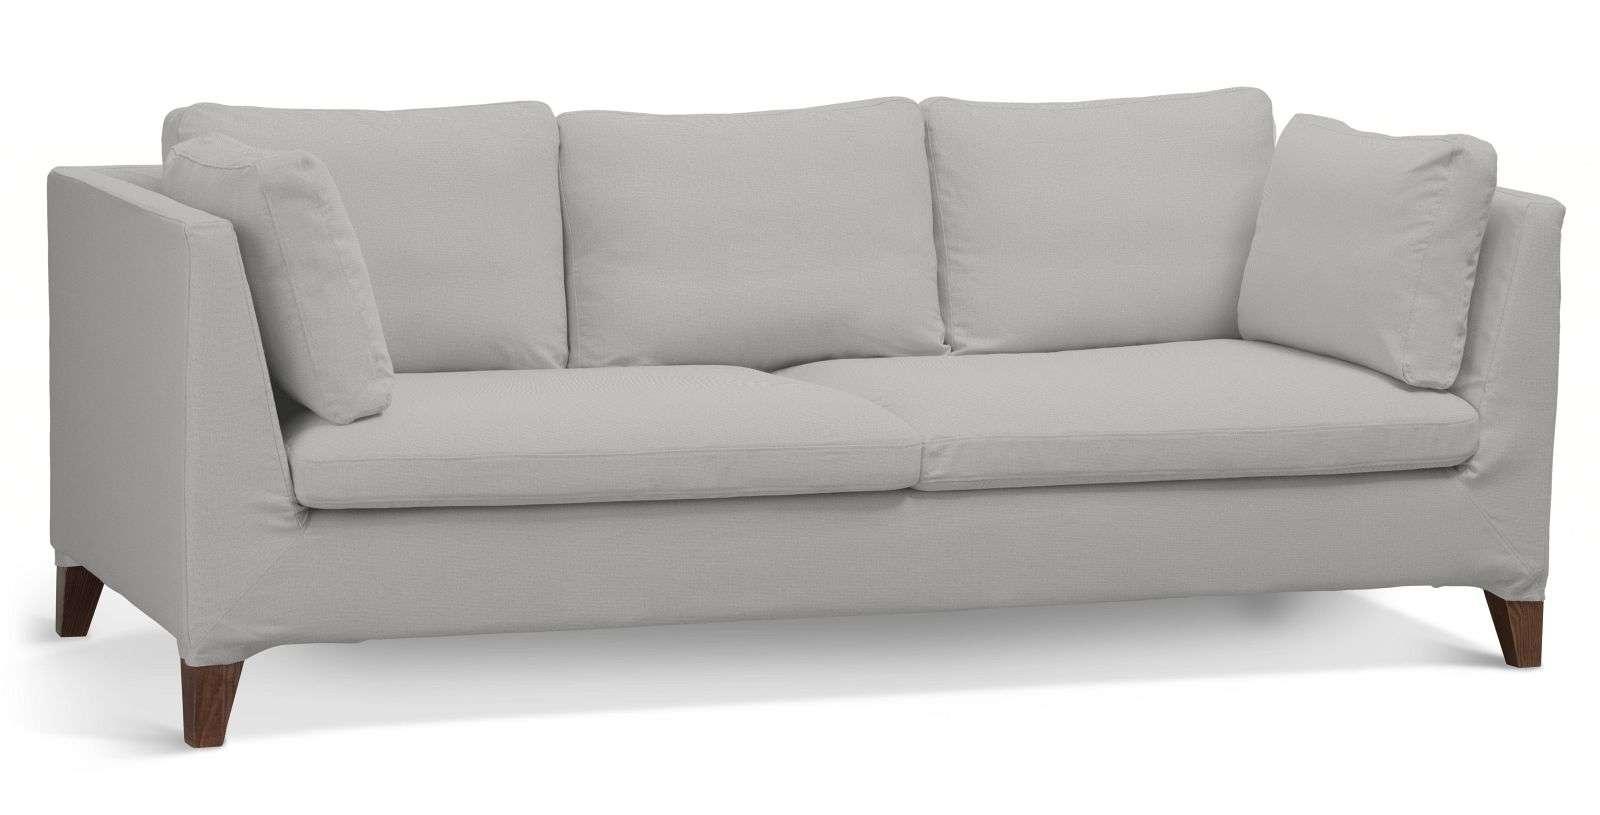 Užvalkalas IKEA trivietei sofai Stockholm  IKEA sofa Stockholm trivietė kolekcijoje Etna , audinys: 705-90